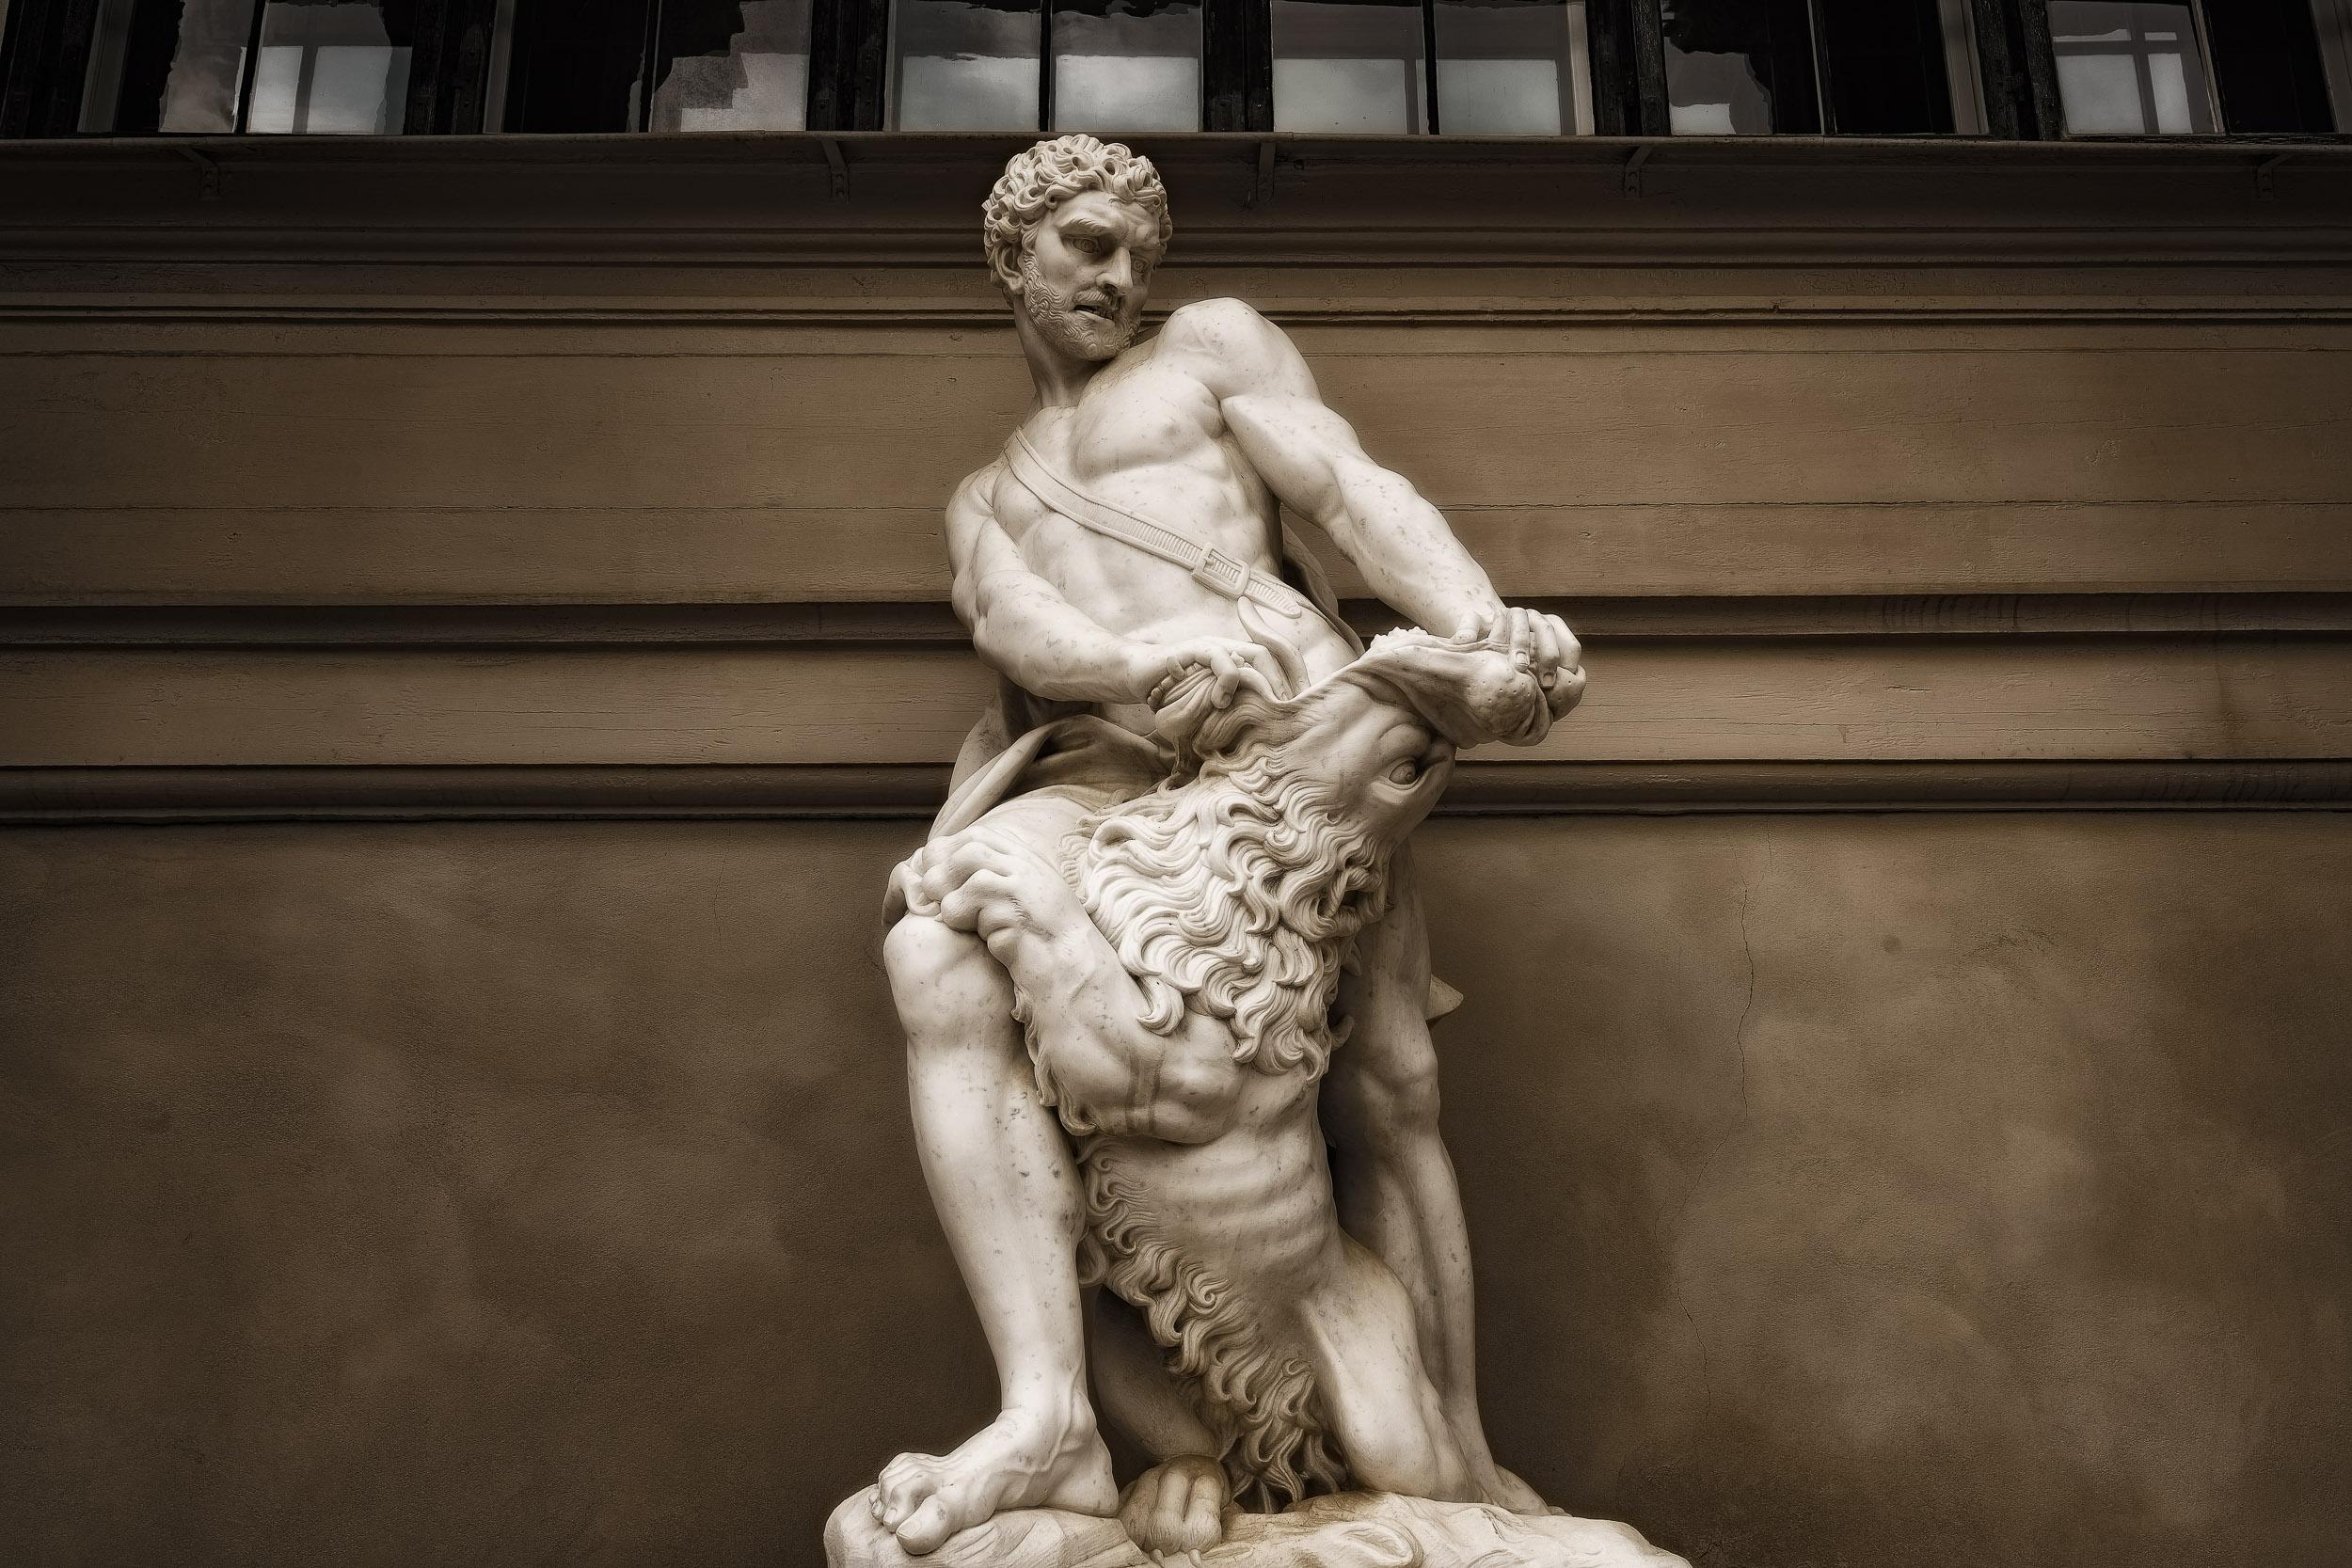 Hercules Statue at the Hercules Pavilion in the Kings Gardens in Copenhagen, Denmark .